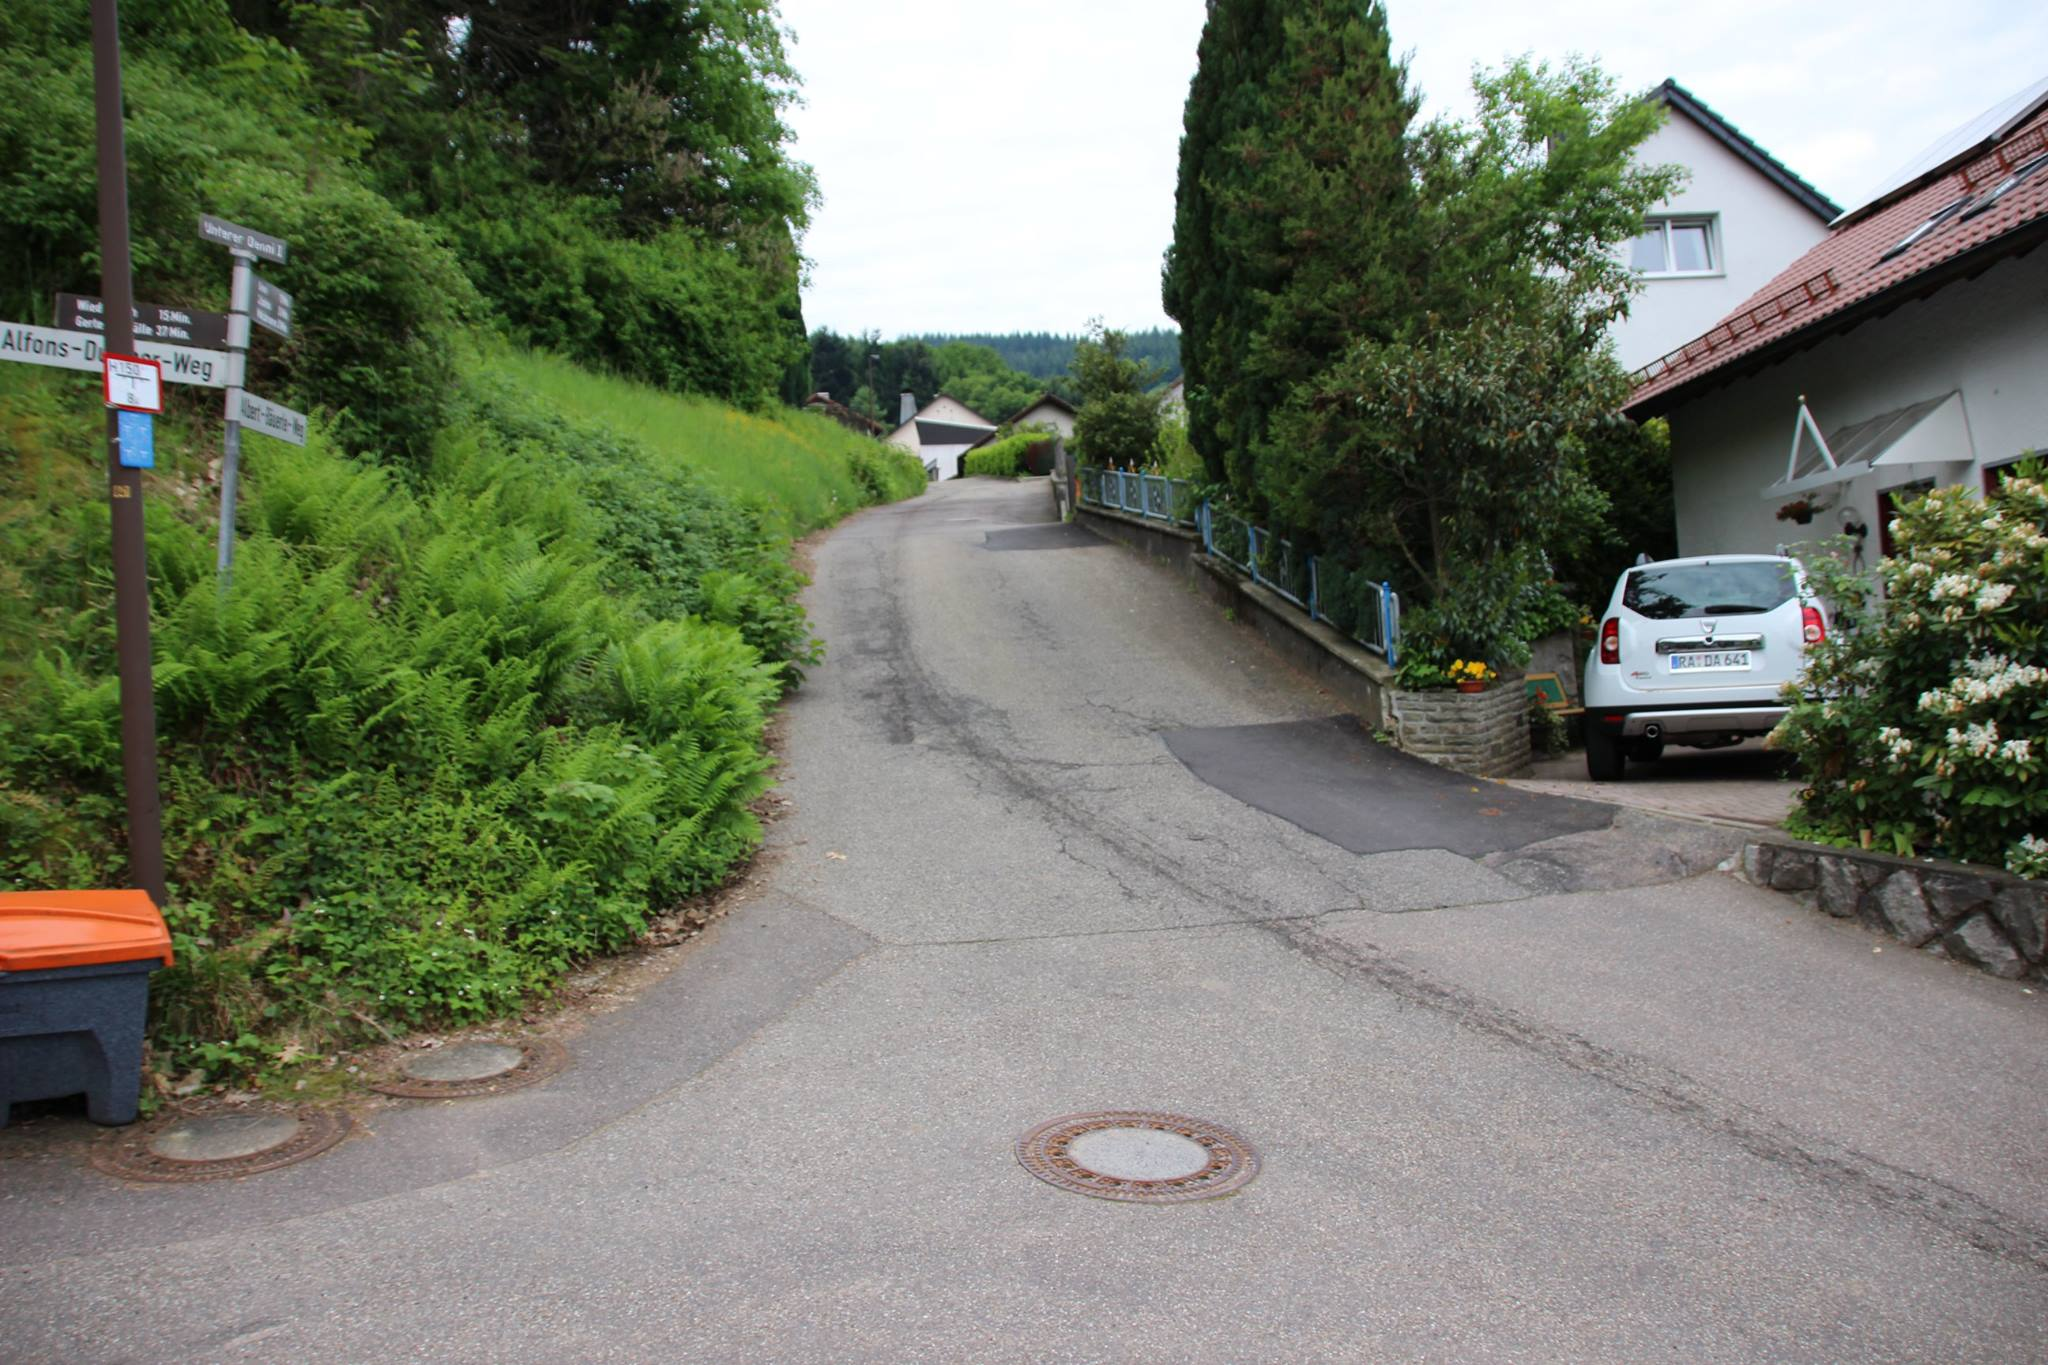 Oelspur_Albert_Baeuerle_Weg